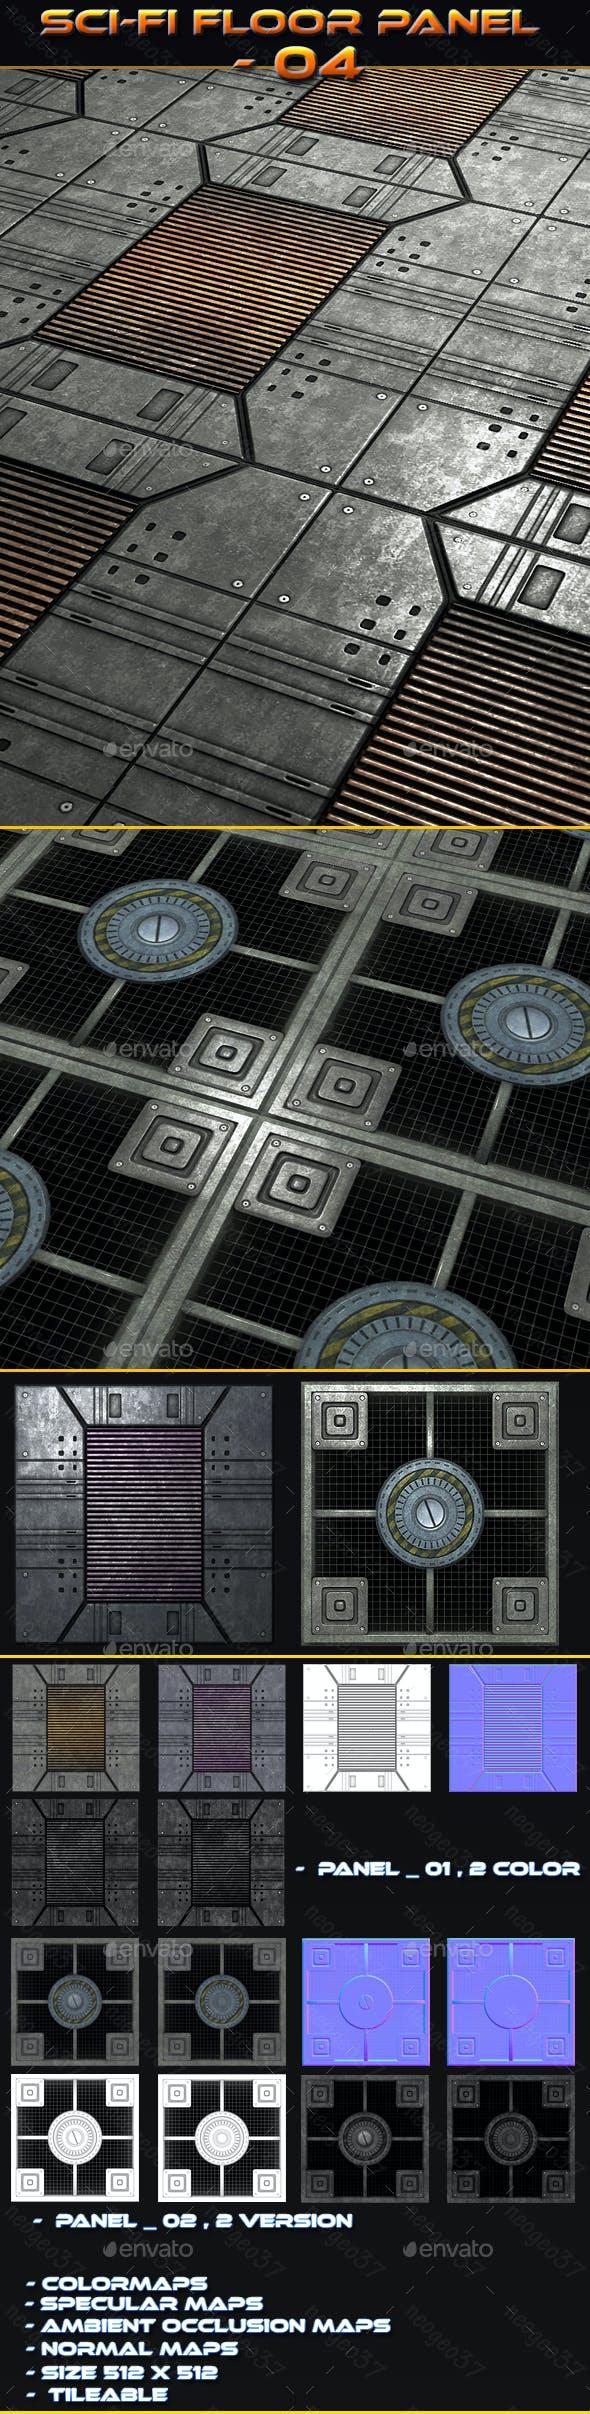 Sci-fi Floor Panel 04 - 3DOcean Item for Sale